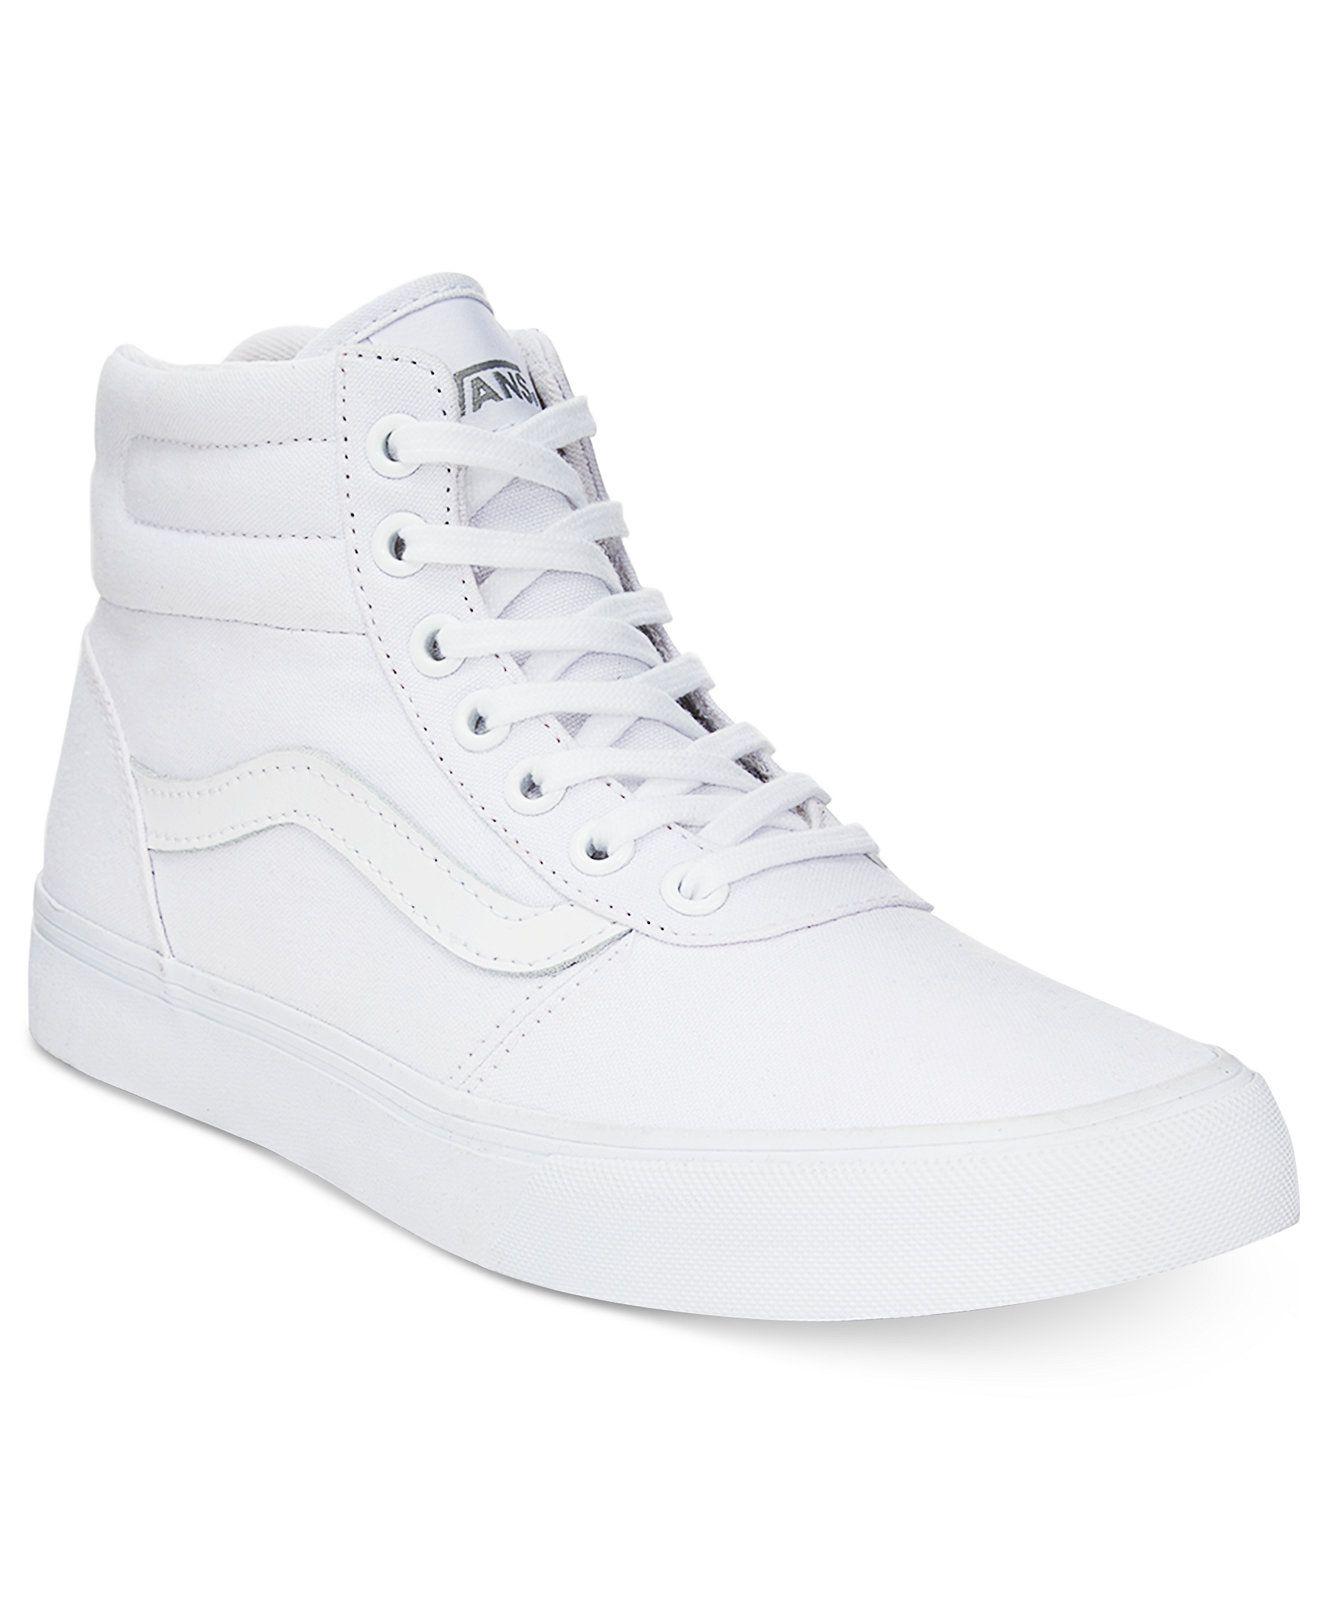 Sneakers - Sneakers - Shoes